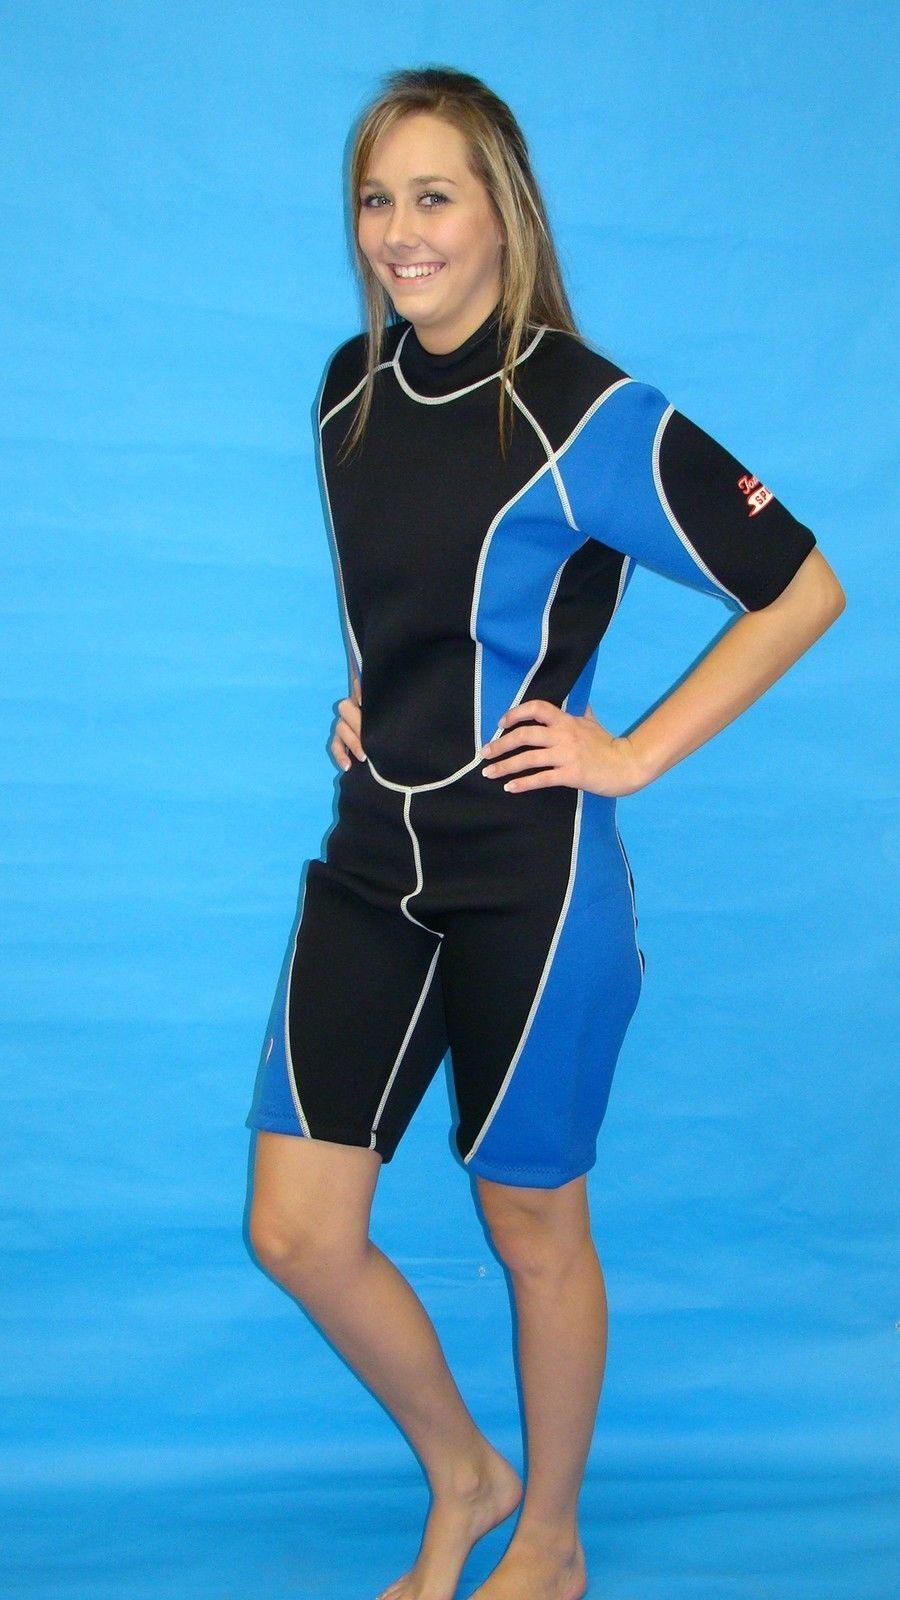 Wetsuit 3mm Large Womens  Shorty Scuba snorkel Gear MBL 9814  healthy